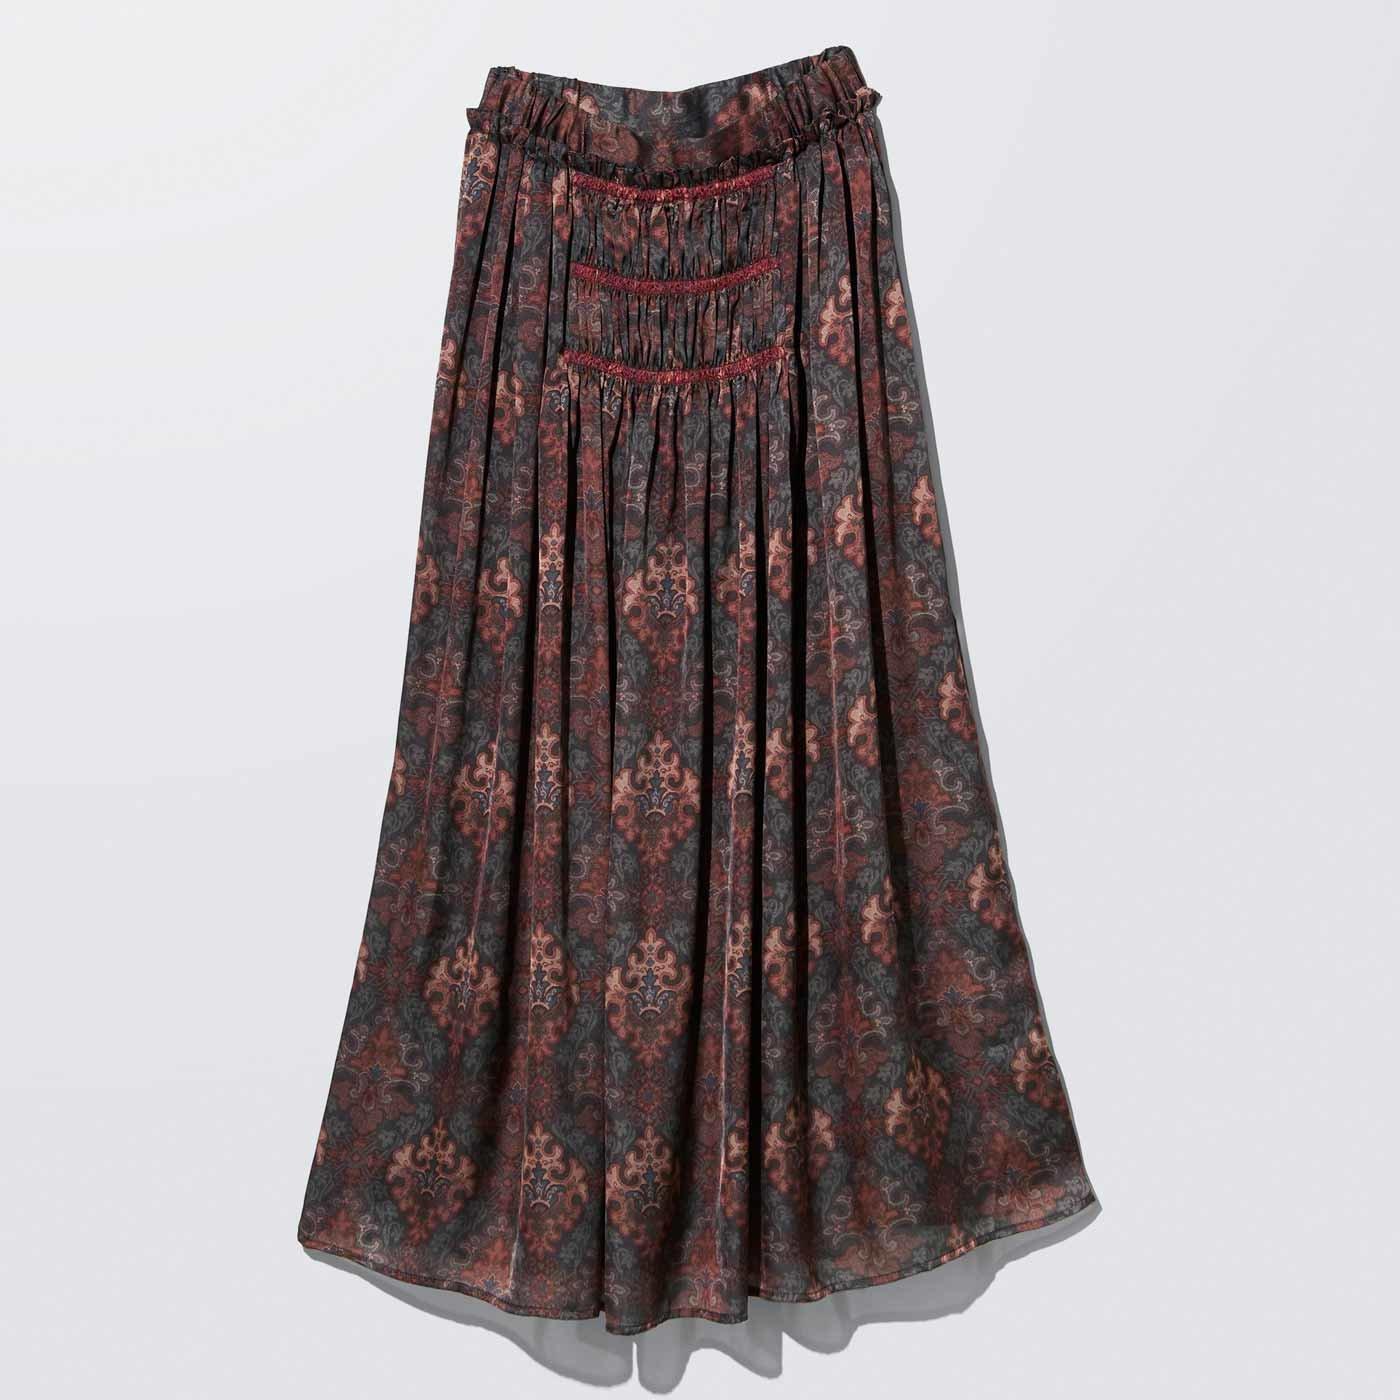 MEDE19F ミュルーズモダン〈「ミュルーズ染織美術館」アーカイブコレクション〉ヴィンテージパターンプリントロングスカート〈フォレストグリーン〉